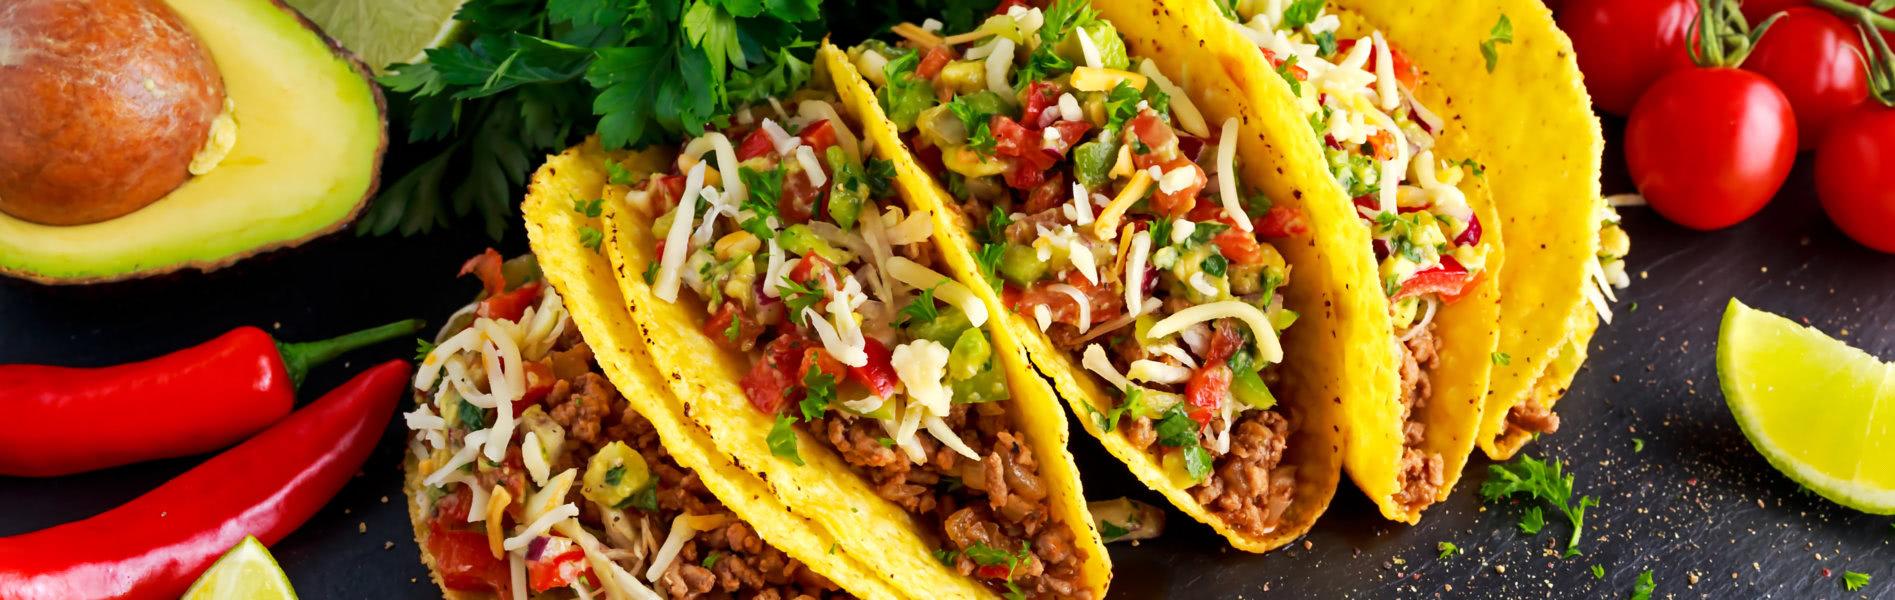 Gefüllte Tacos - Mexican Food Truck München - UNIKORN Catering